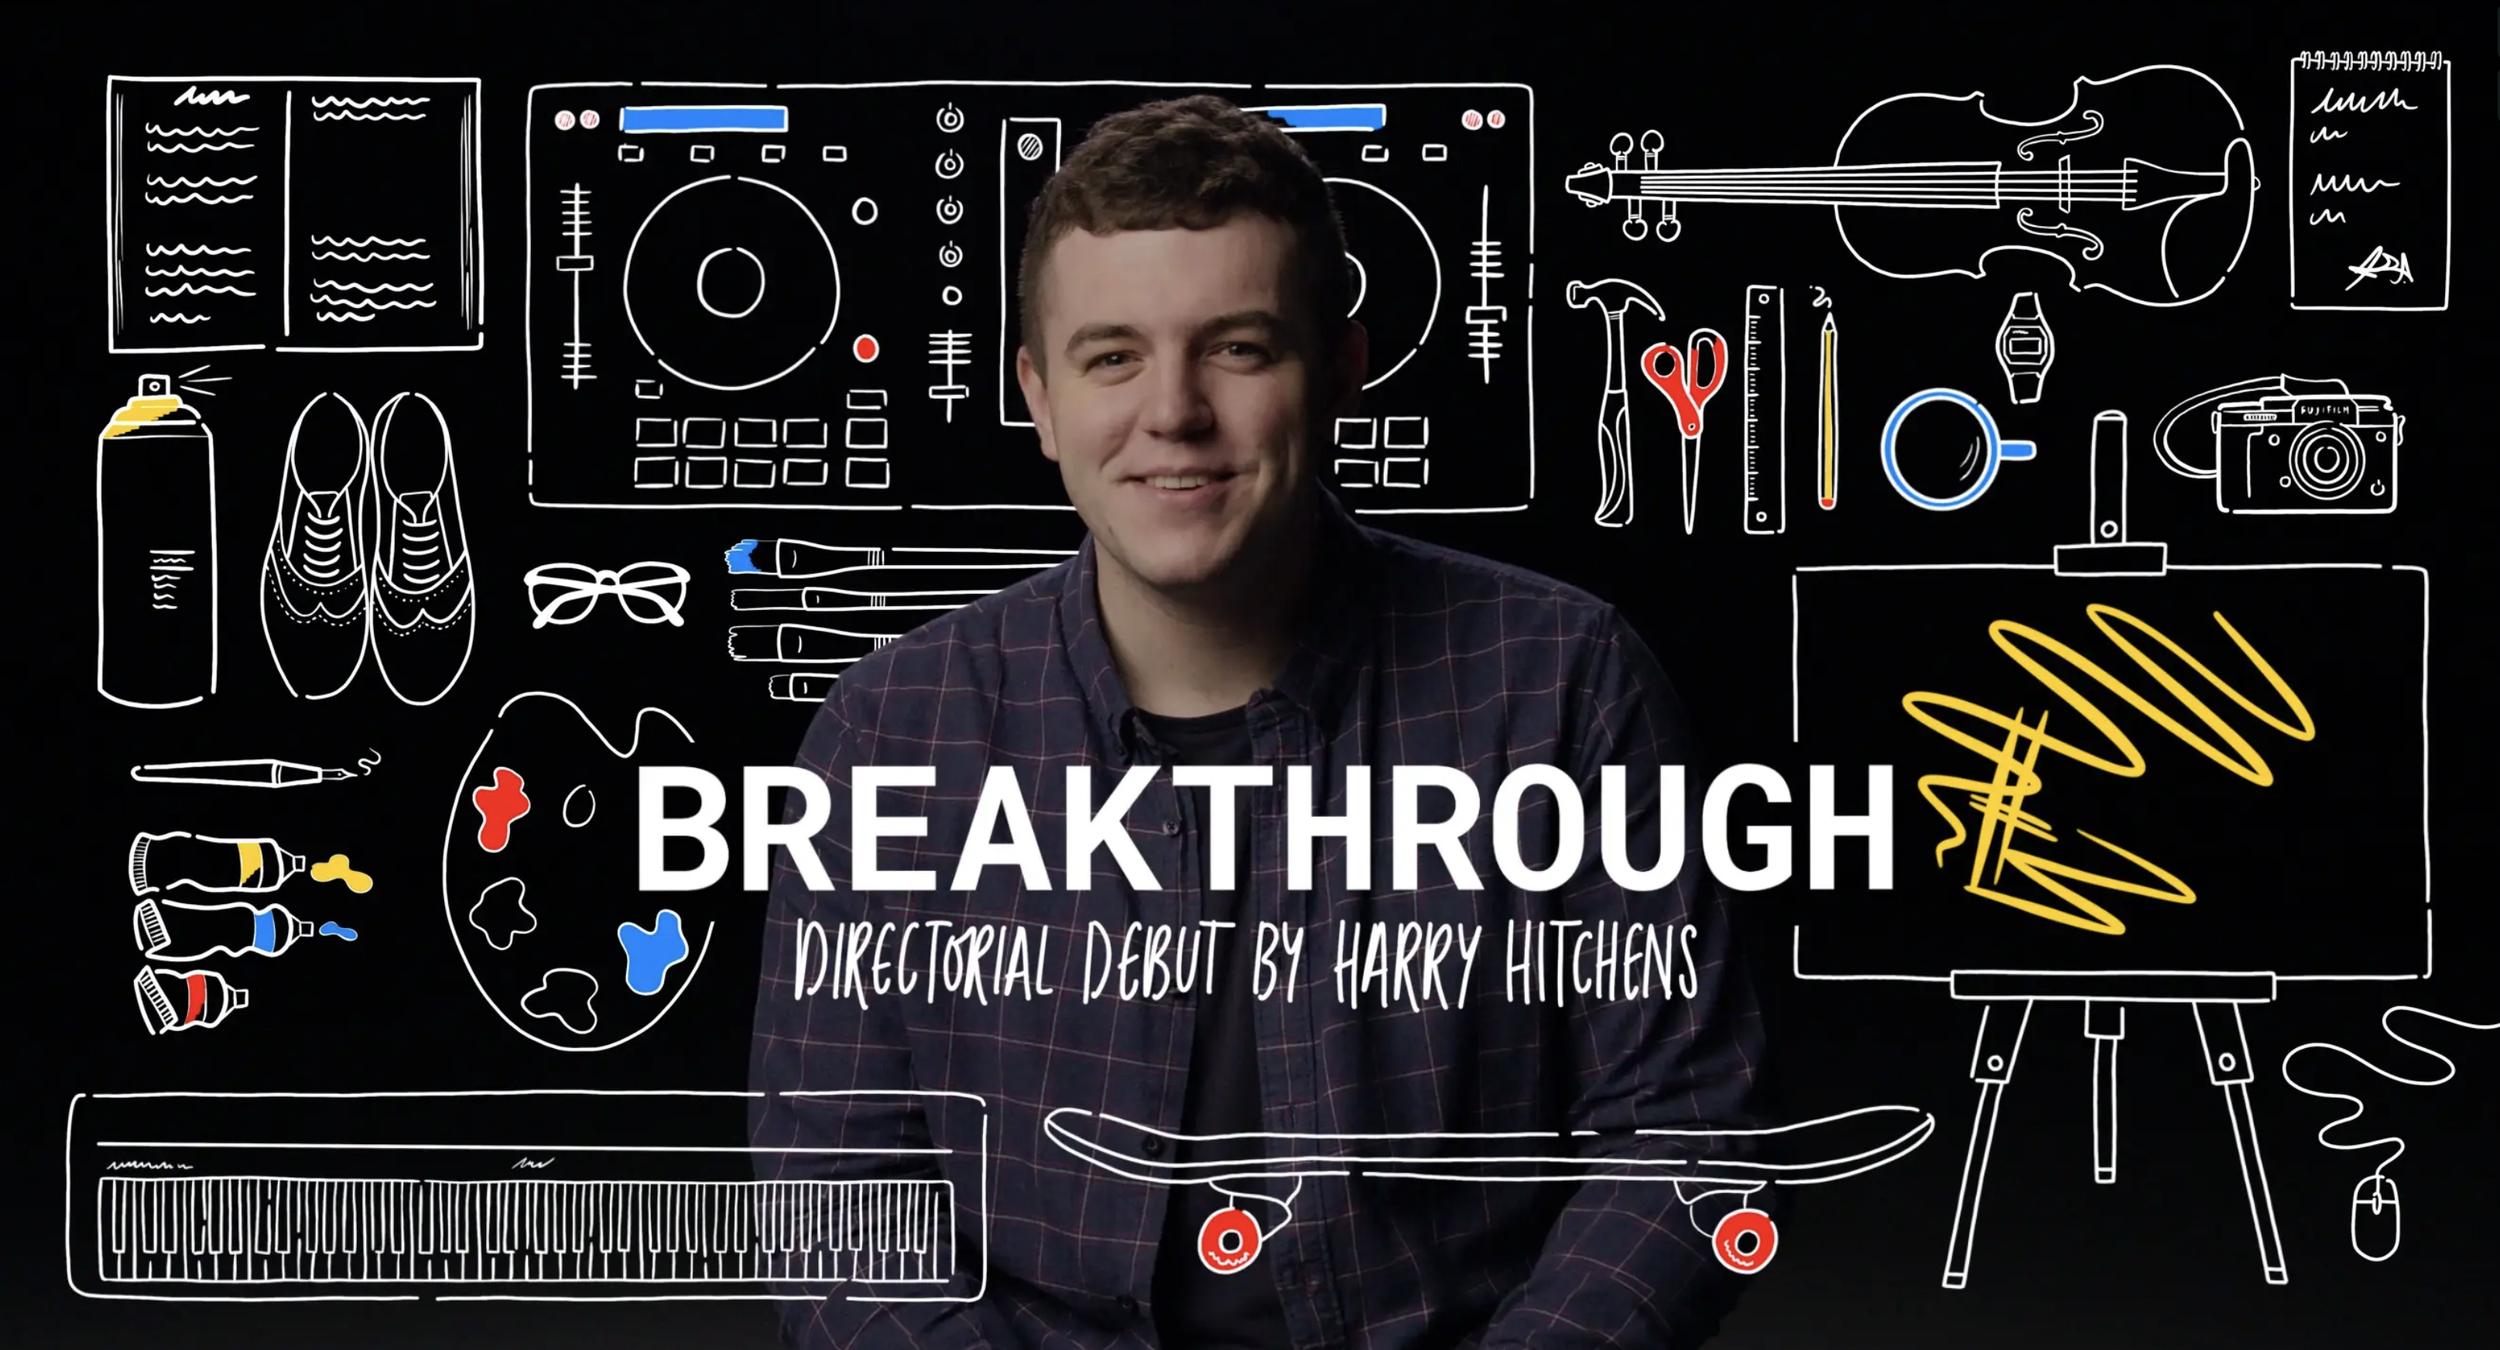 breakthrough-header.png